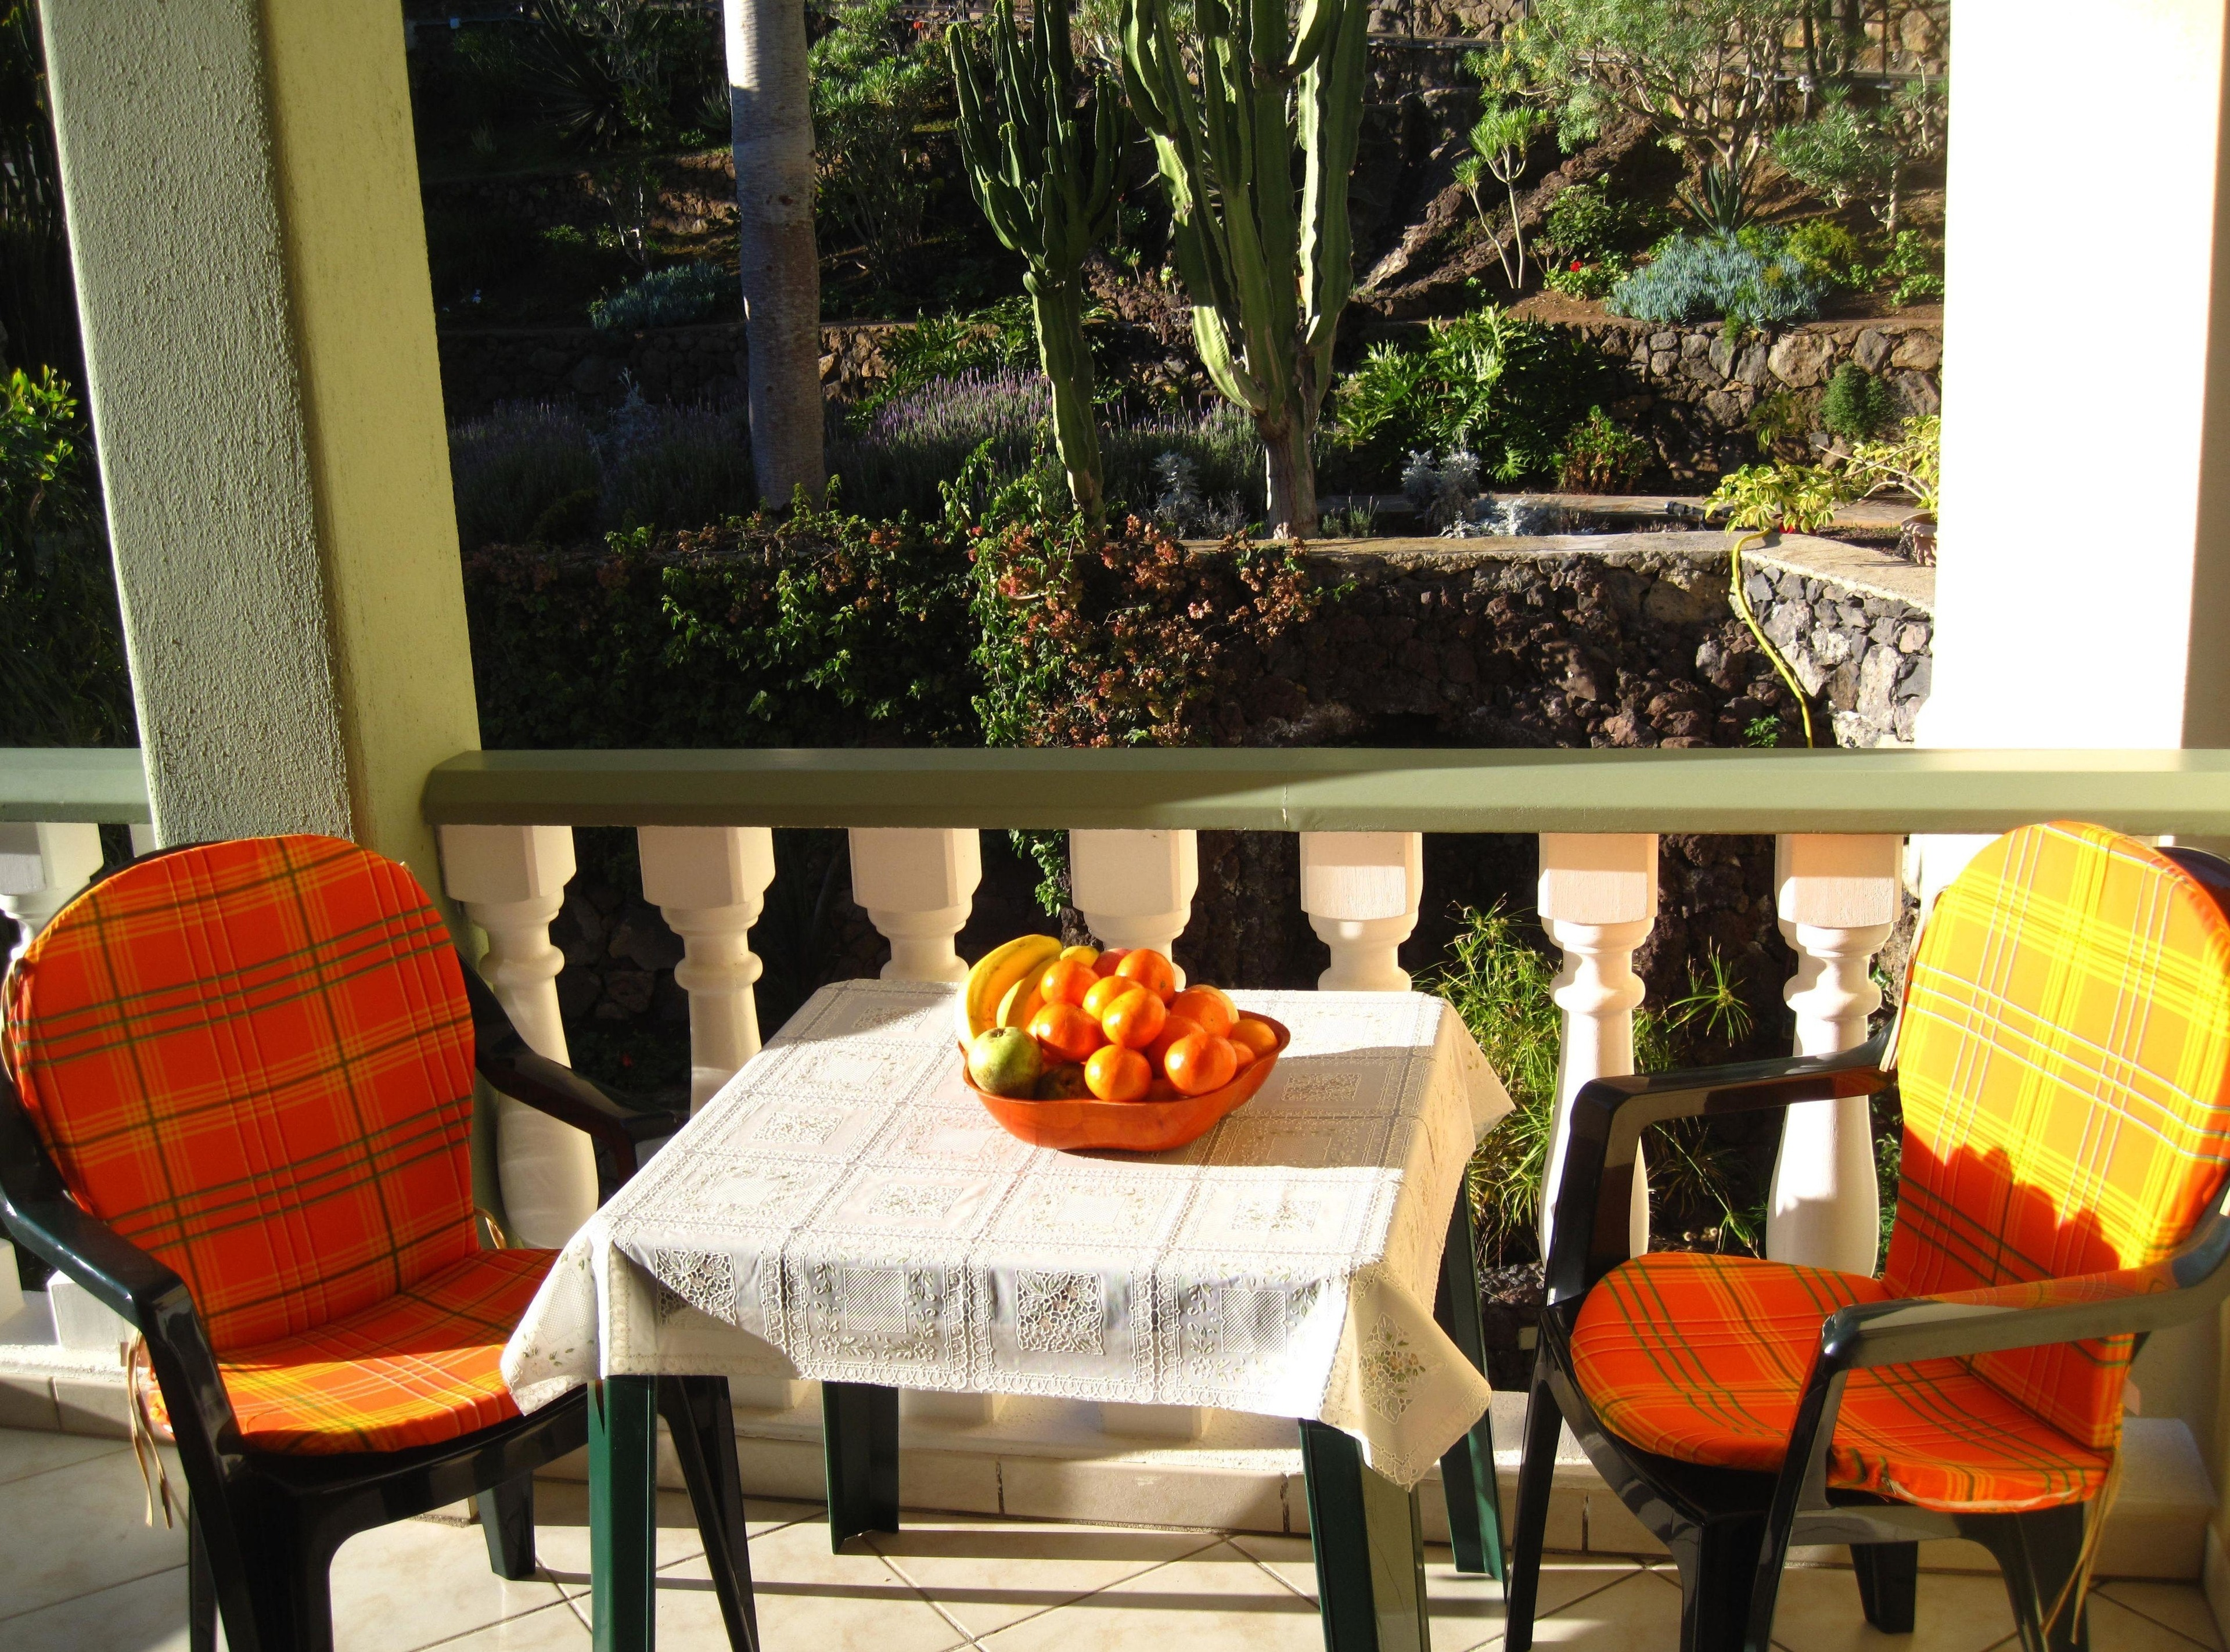 Appartement de vacances Fewo Atico Florasol, sehr ruhig direkt am Naturschutzgebiet, mit Pool, 2 Terrassen, Grill, (2492983), Santa Ursula, Ténérife, Iles Canaries, Espagne, image 4